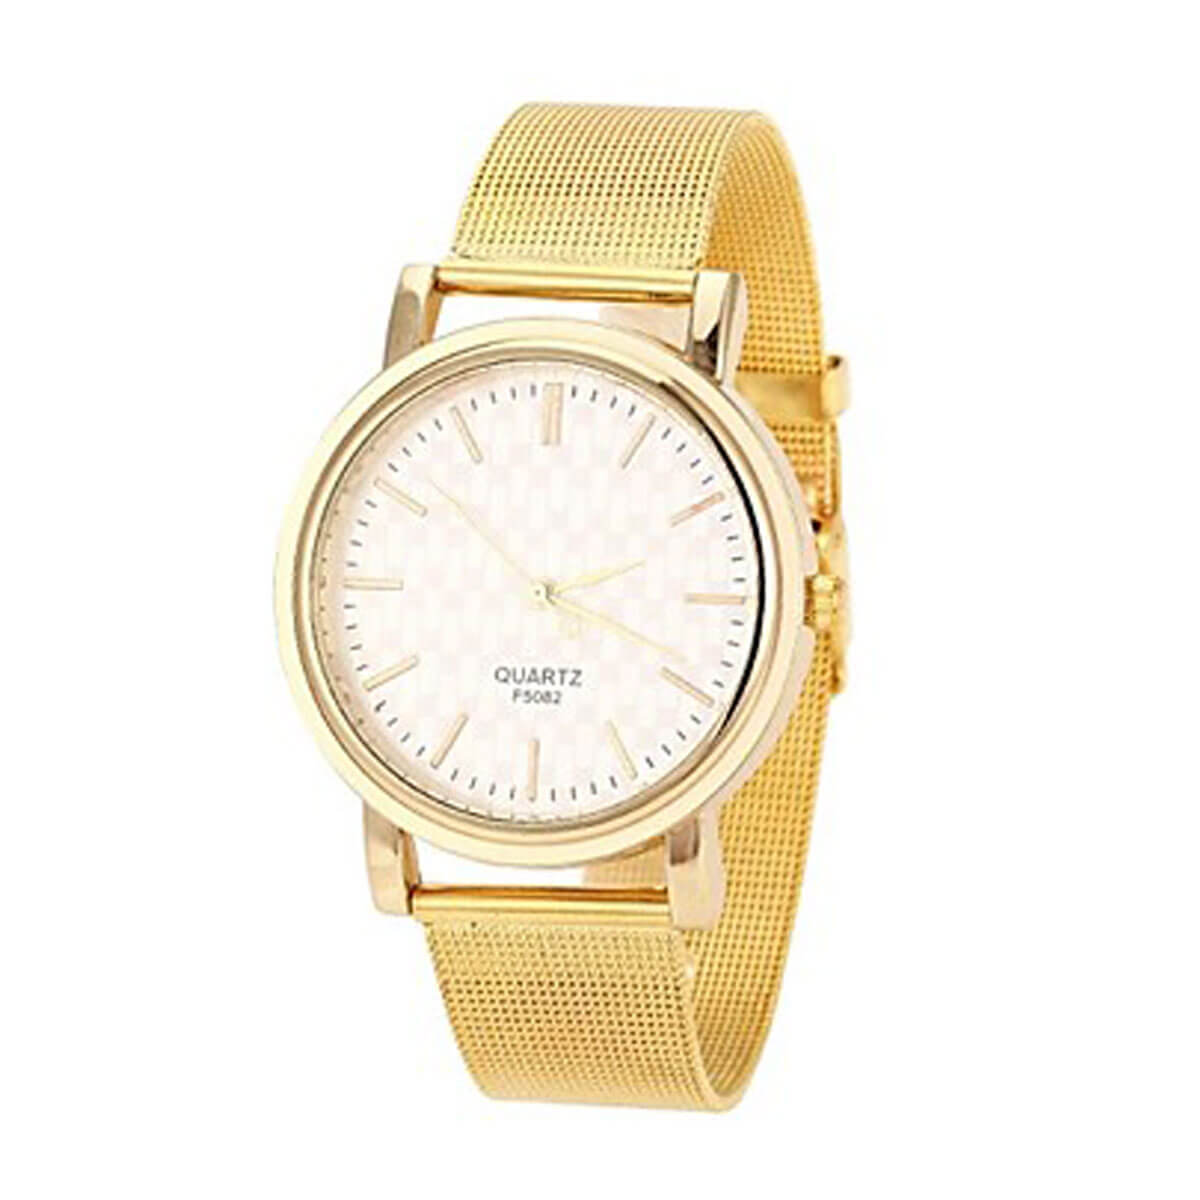 Zlaté dámske hodinky Quartz F 5082